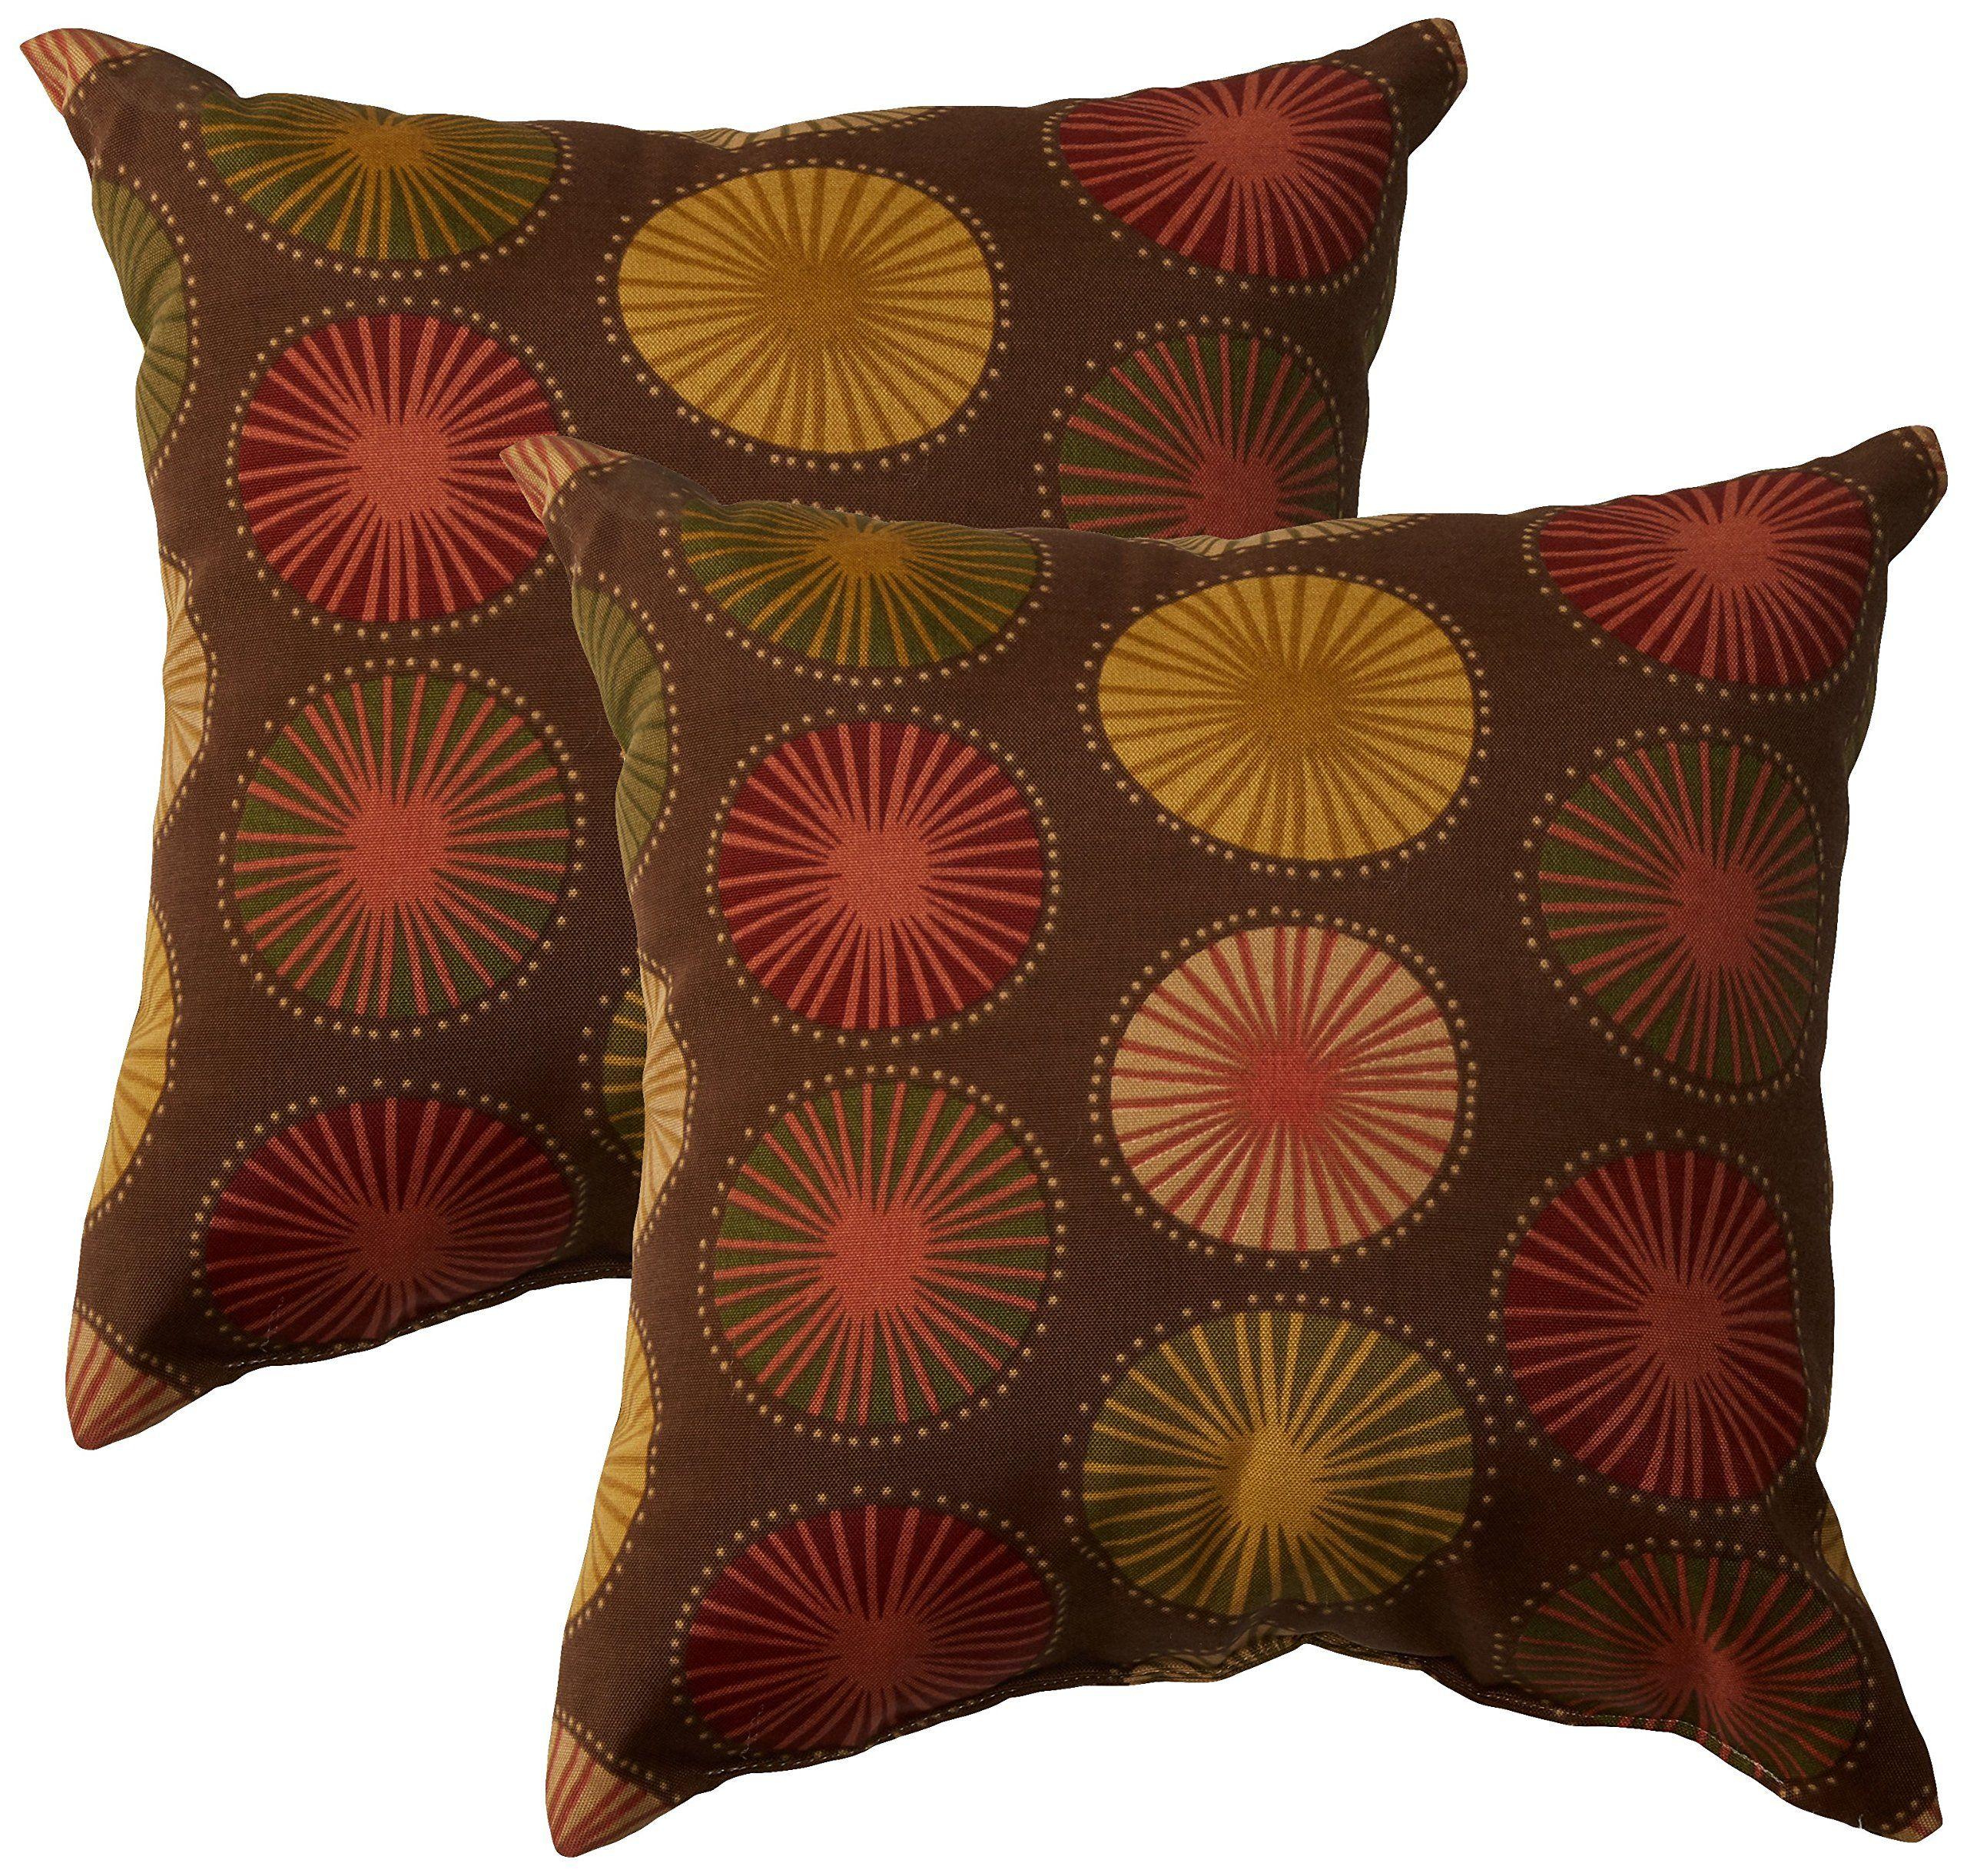 Tkc Pillow Brnsunb 18x18 2x Outdoor Throw Pillow Set Of 2 Sunburst Lavorist Outdoor Throw Pillows Patio Decor Backyard Furniture Decor